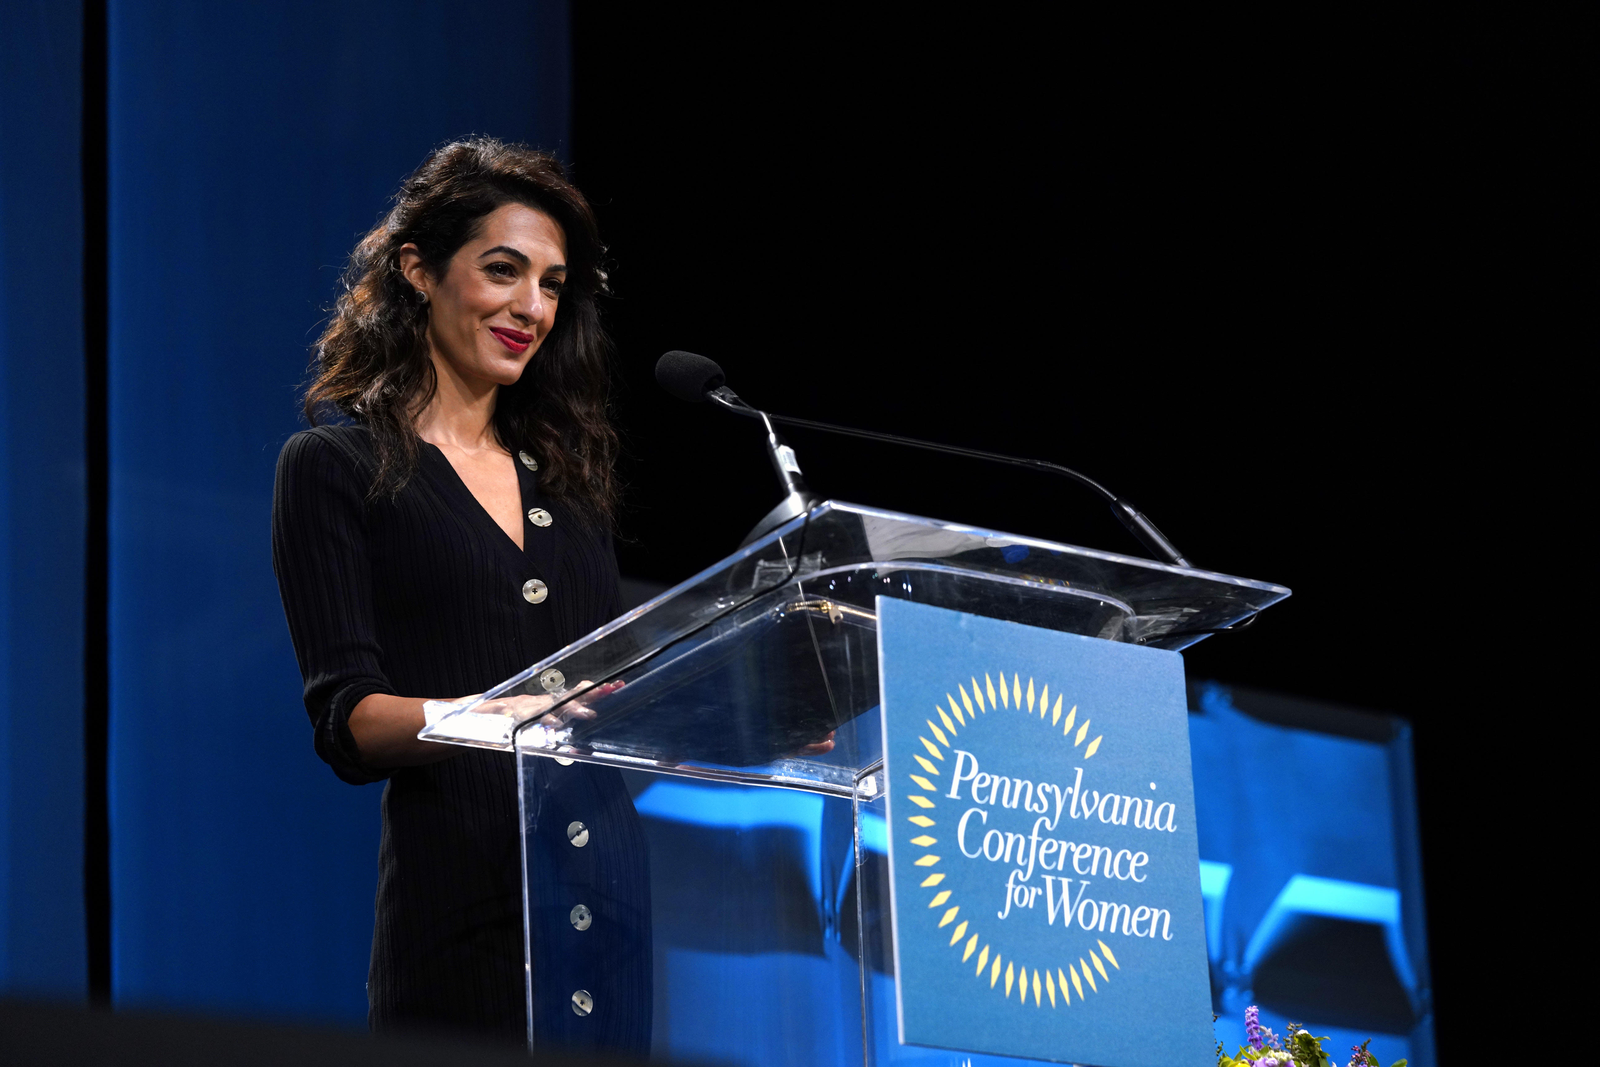 Amal Alamuddin-Clooney vestida de PAULE KA